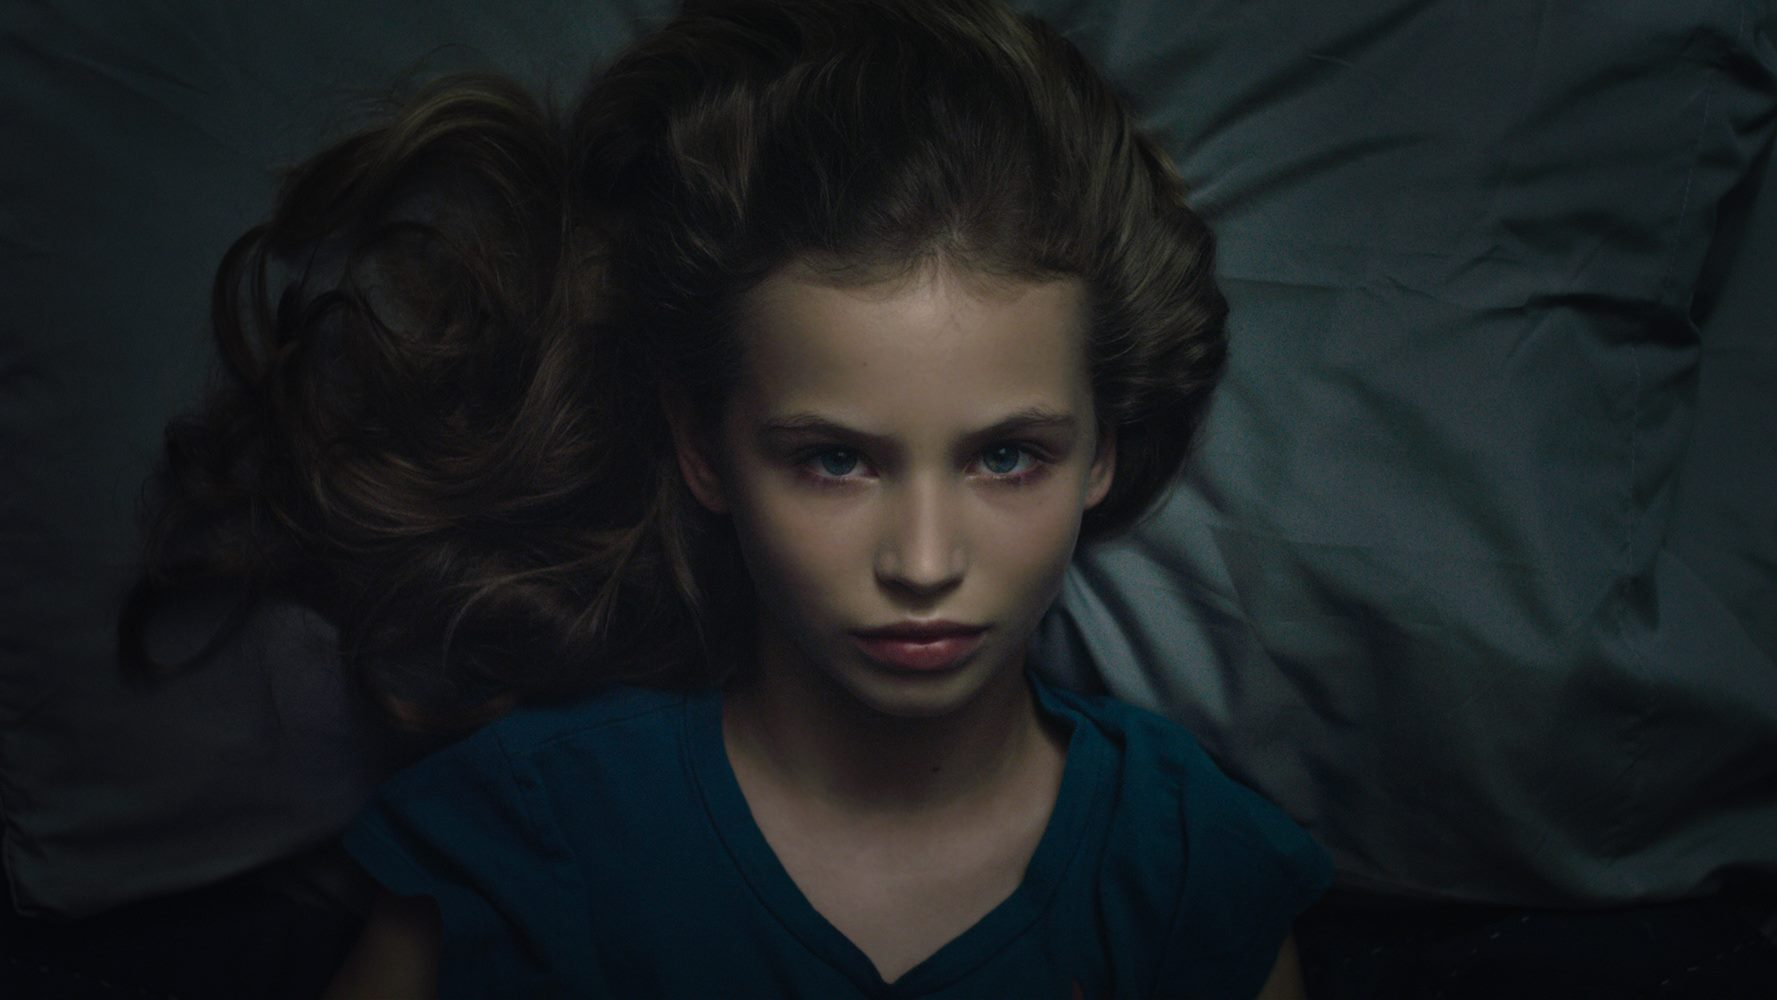 Break My Bones: Violet awake in bed at night.